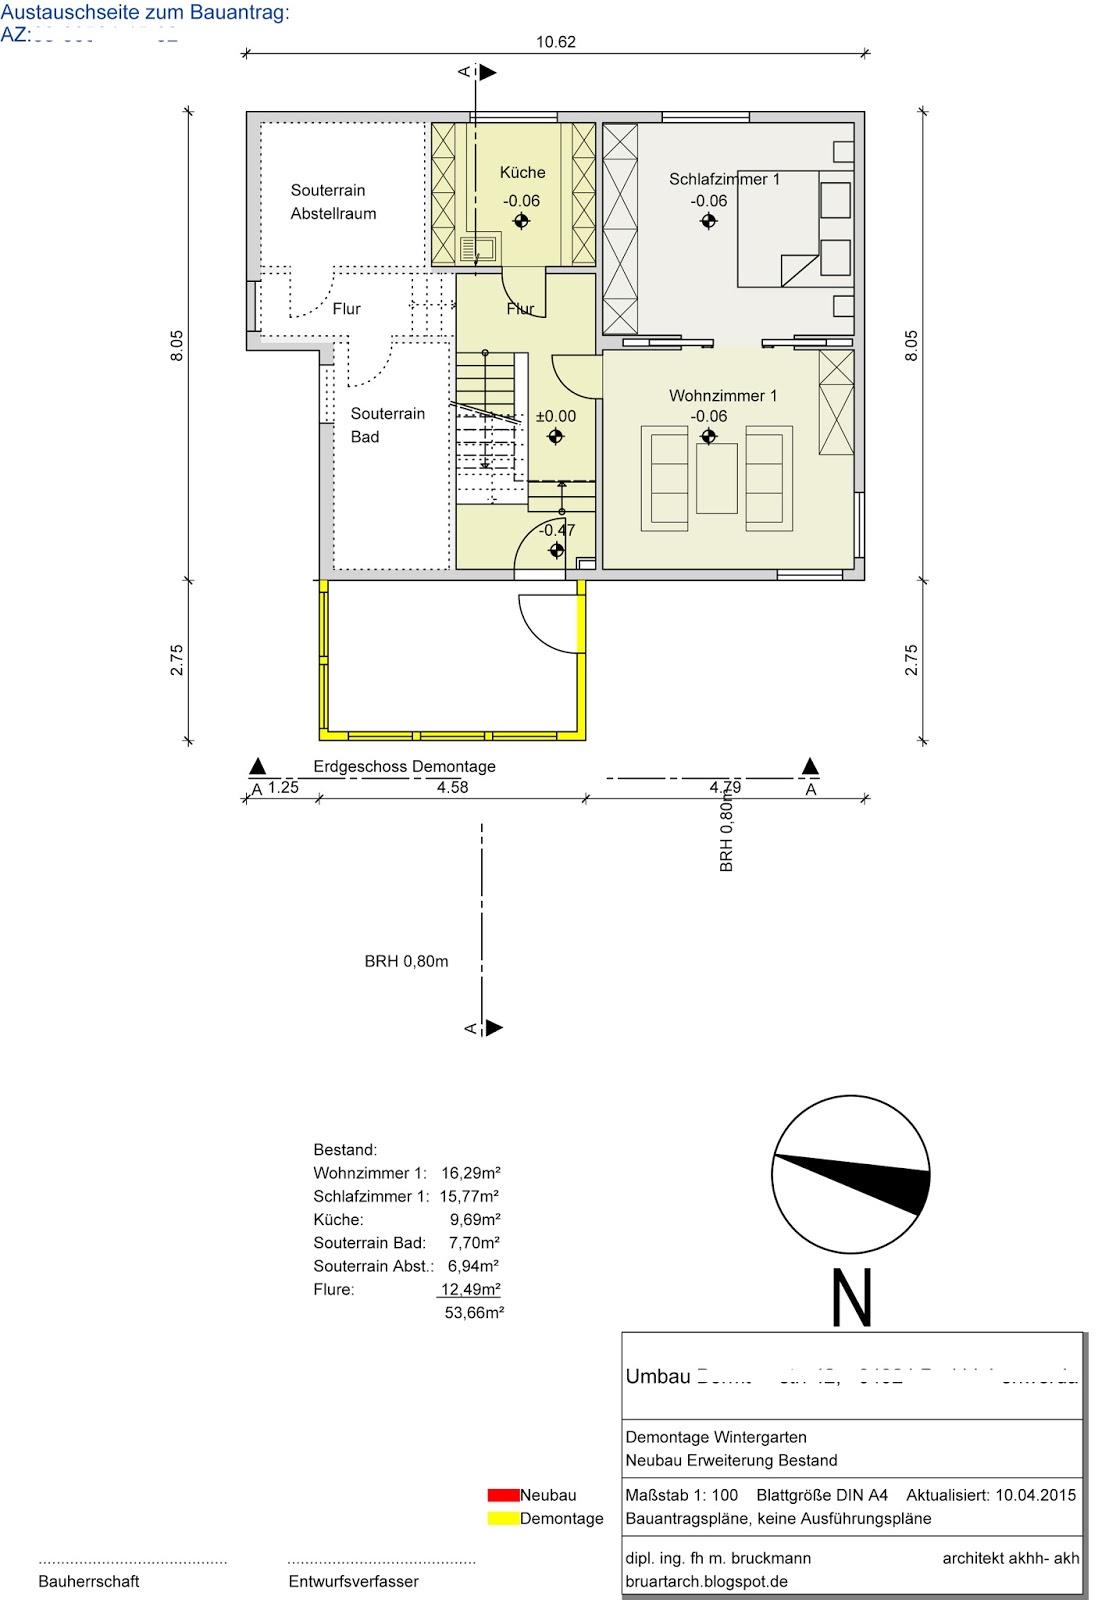 Architektur kreativit t kunst bauantrag abbruch for Architektur 4 1